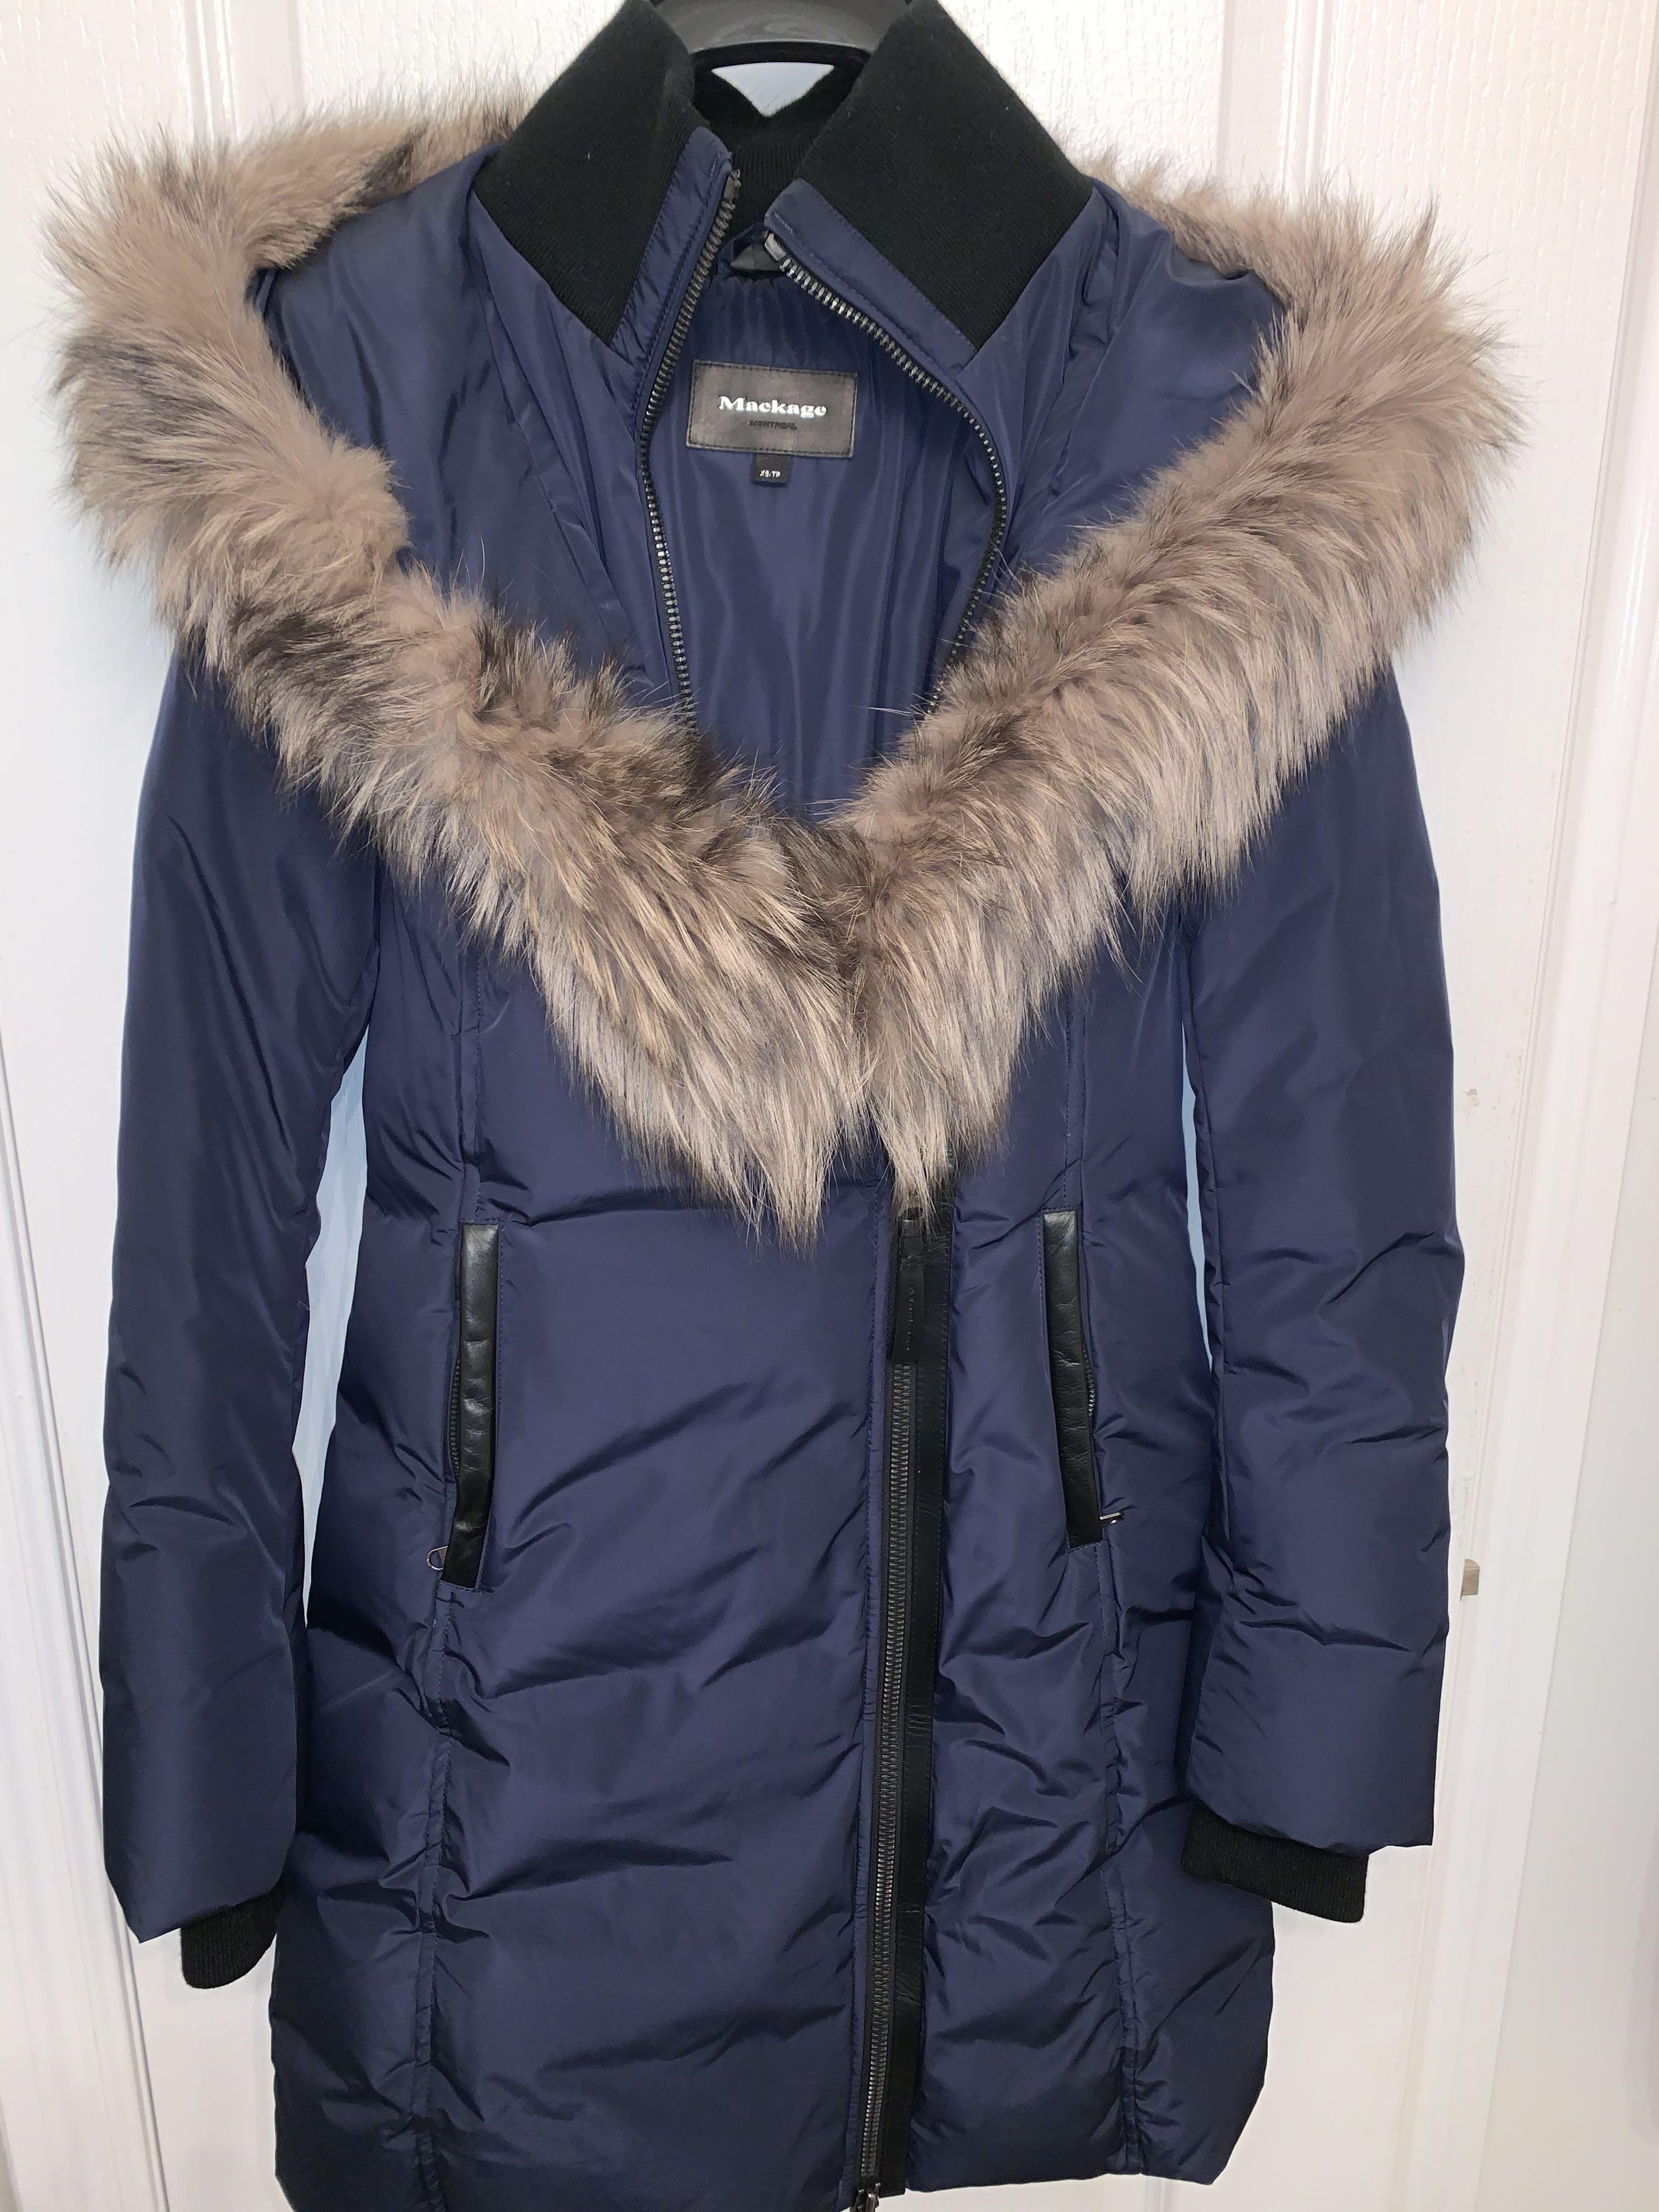 Brand new Mackage Kay down jacket